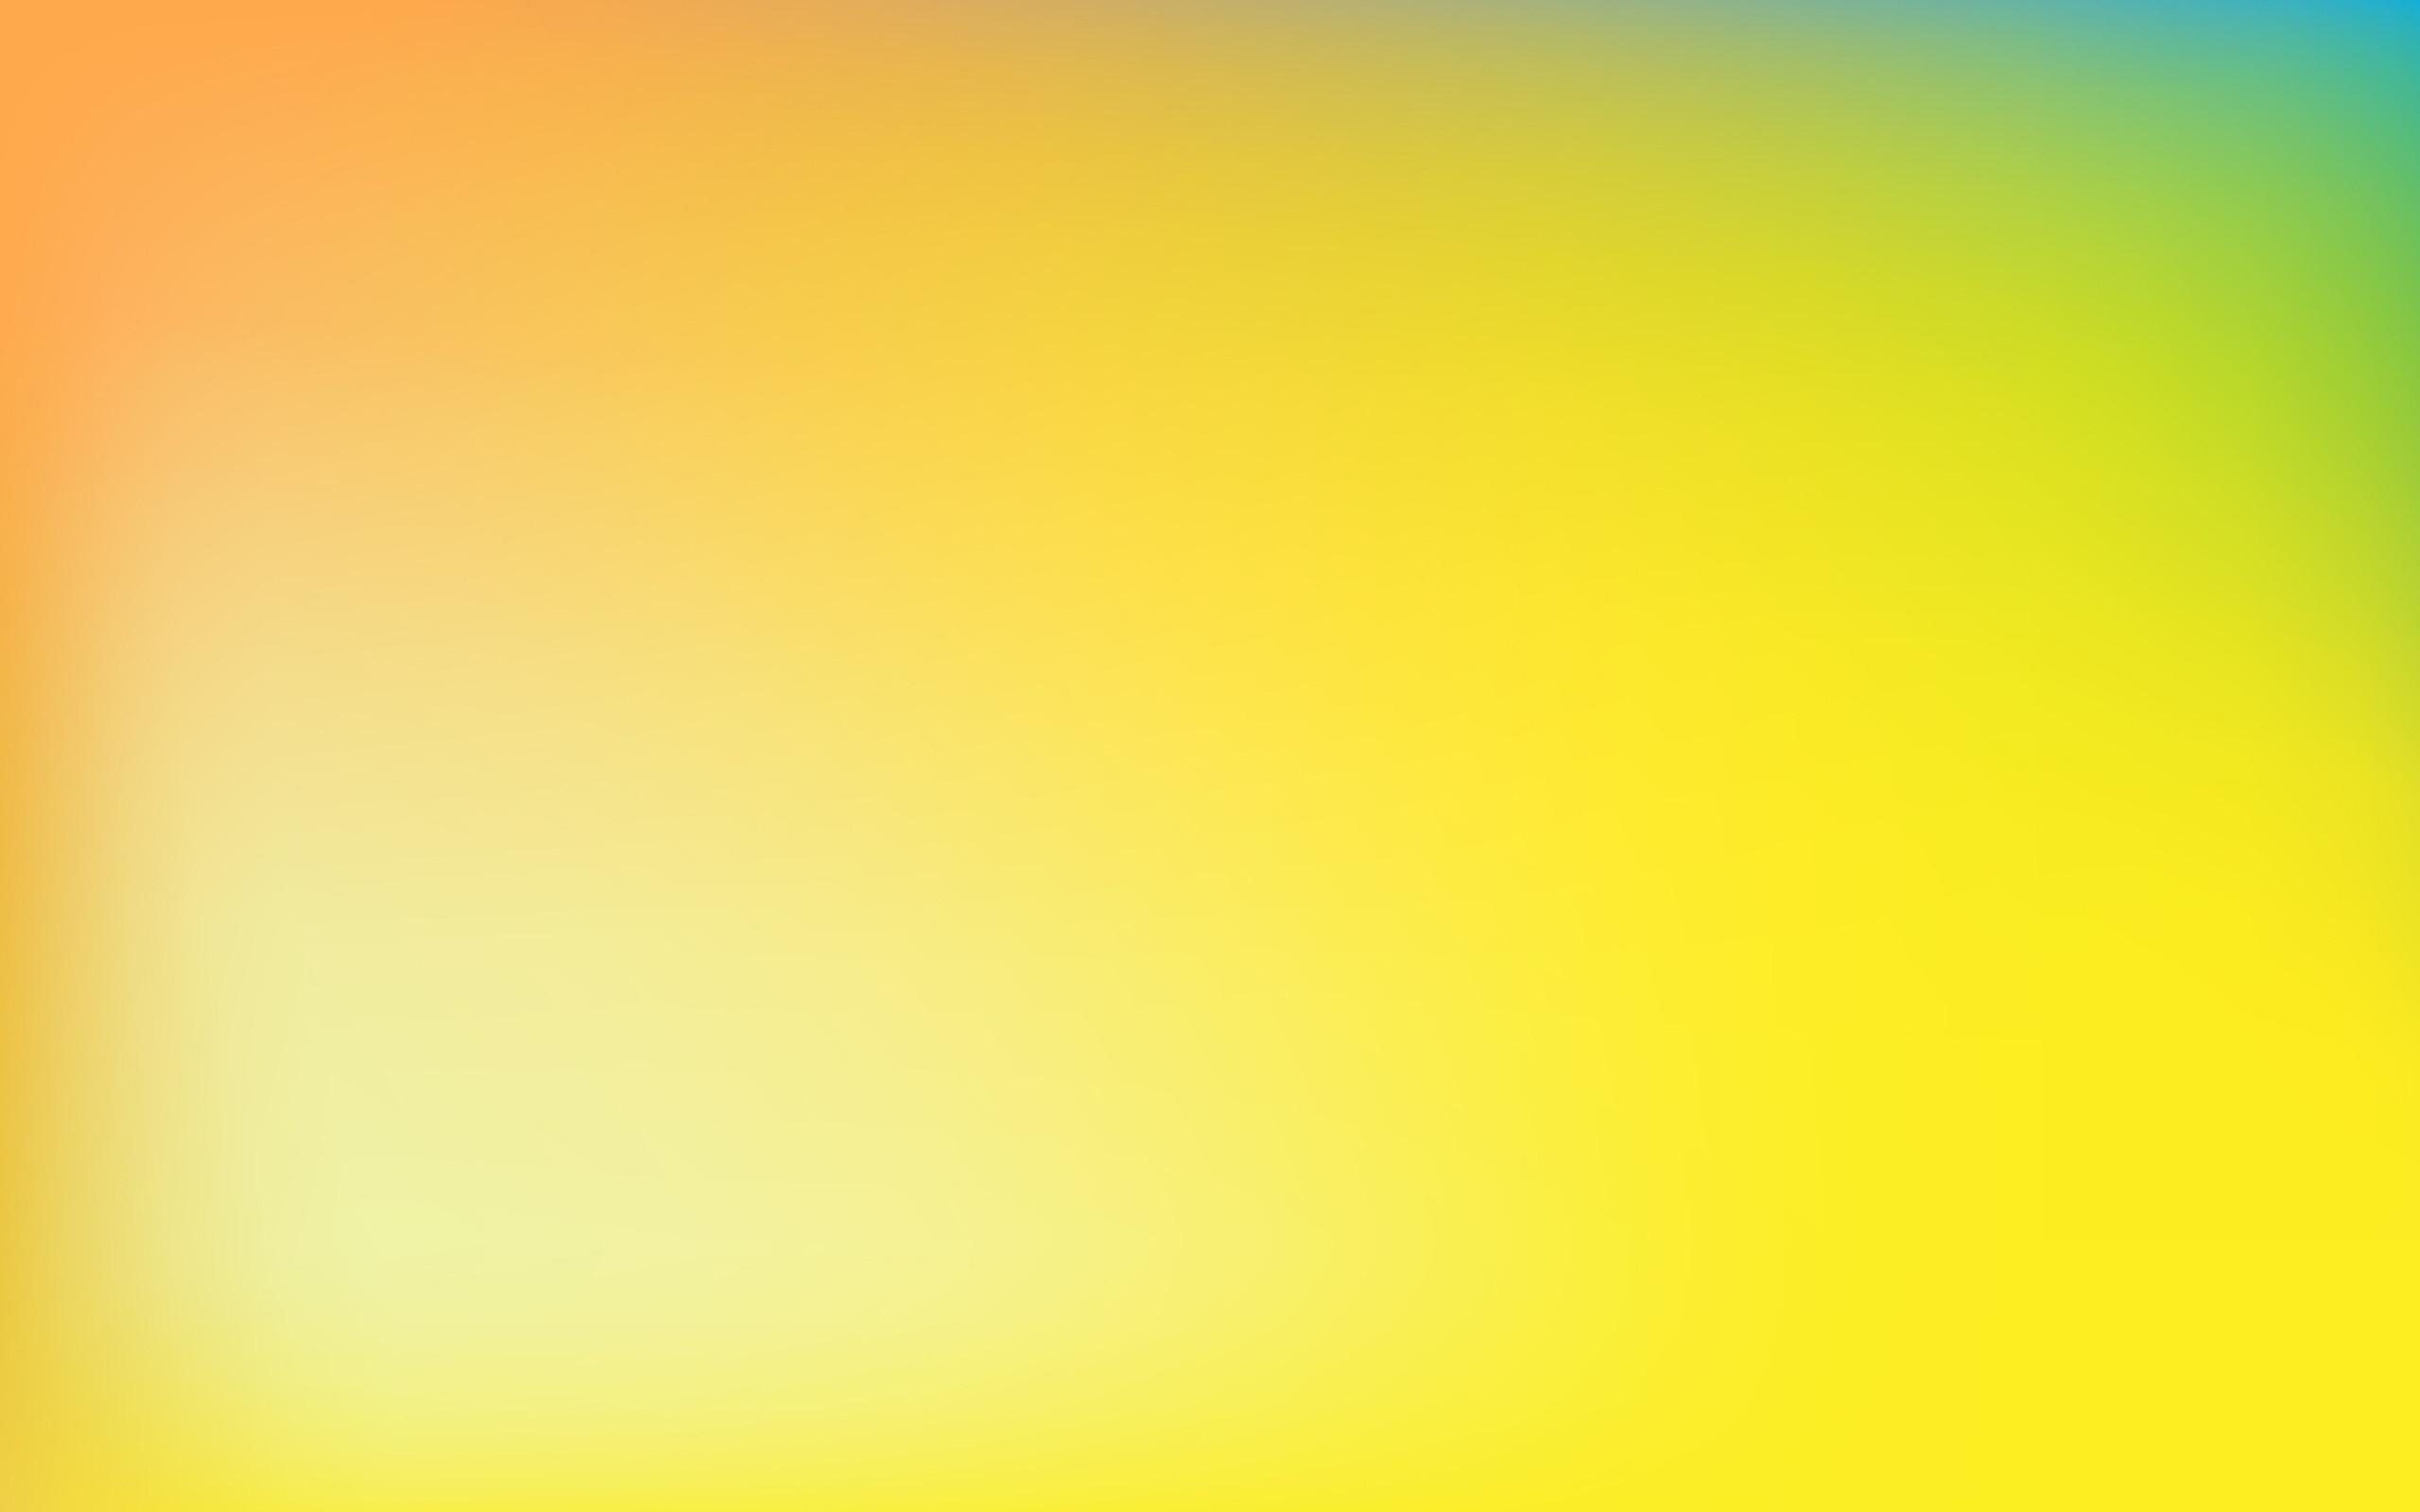 neon yellow background  u00b7 u2460 wallpapertag